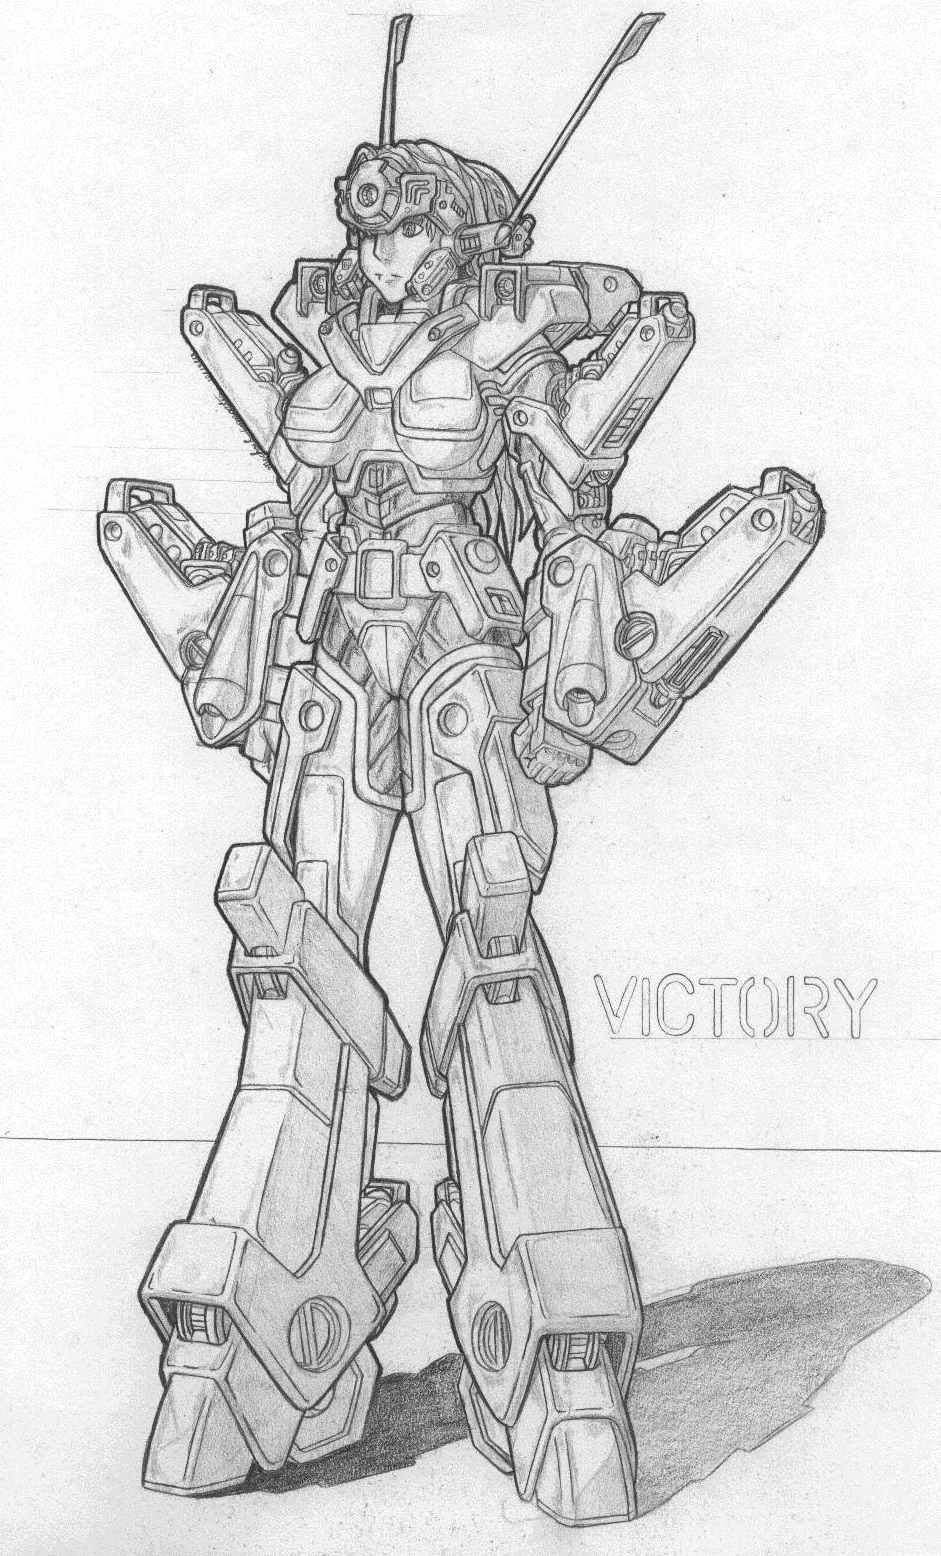 MekGirl: Victory Image 2 by AceDarkfire